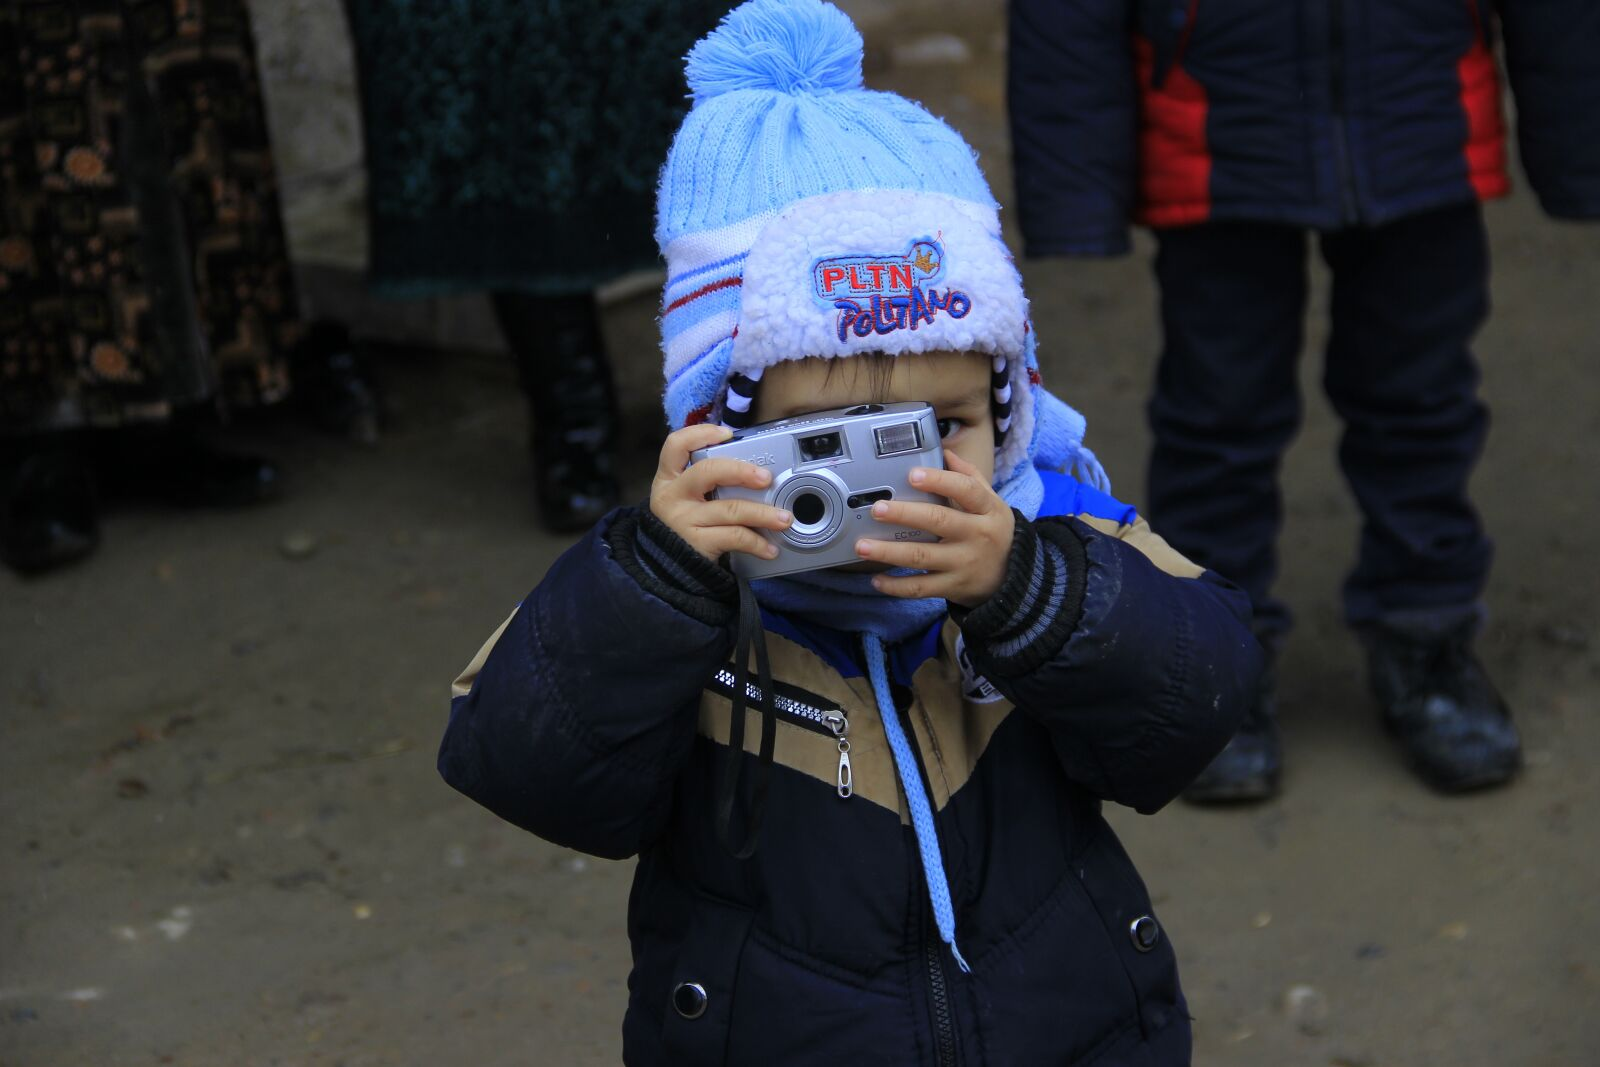 Canon EOS 600D (Rebel EOS T3i / EOS Kiss X5) sample photo